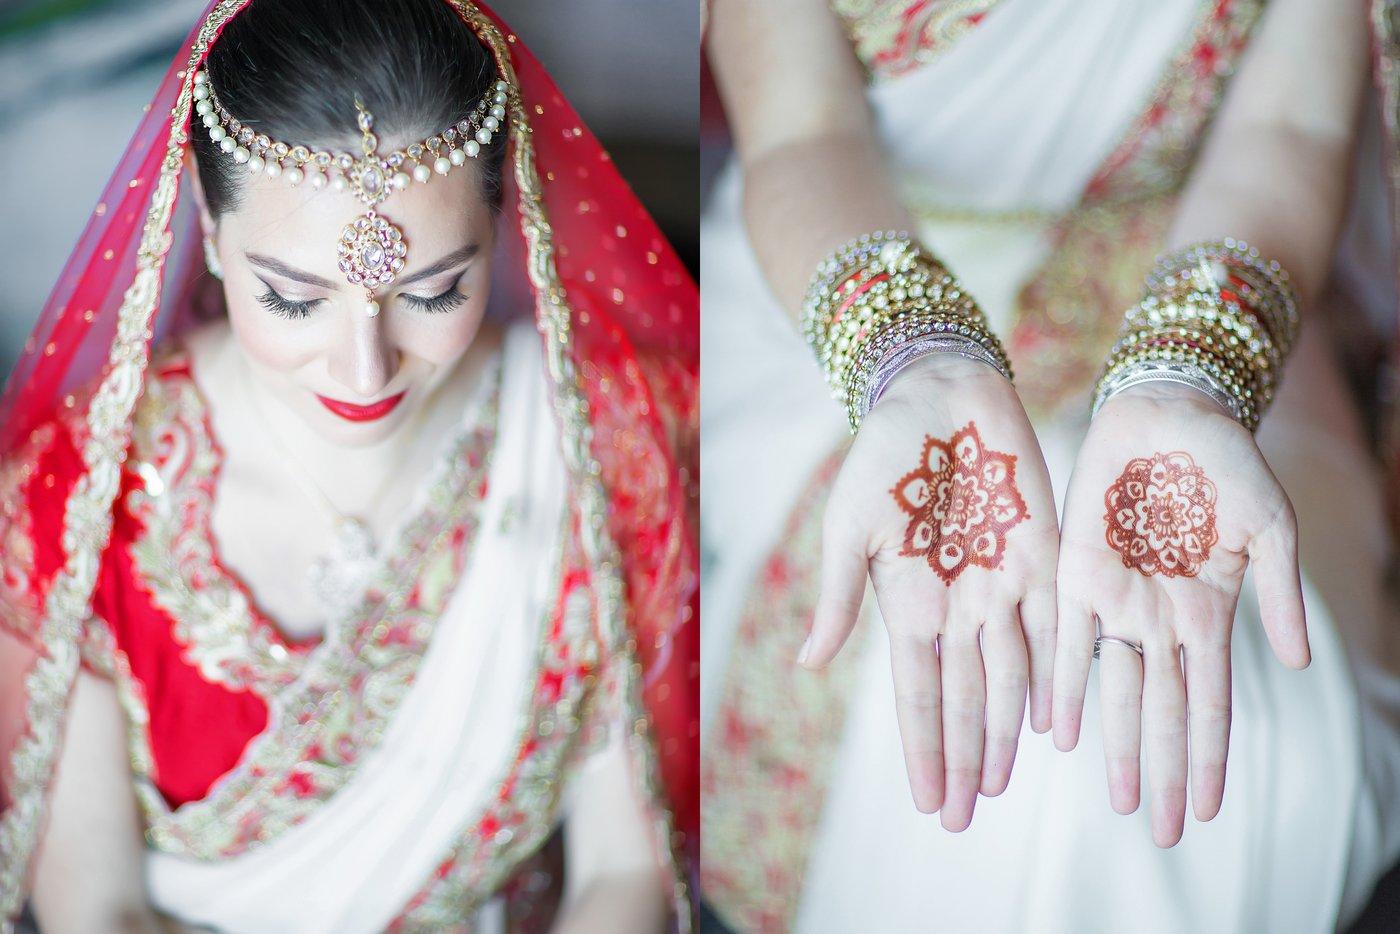 Bridal Mehndi, Miami Wedding Photographers | Häring Photography, Indian Wedding Photographer in Florida, Best Muslim, Hindu - South East Asian Wedding Photographers